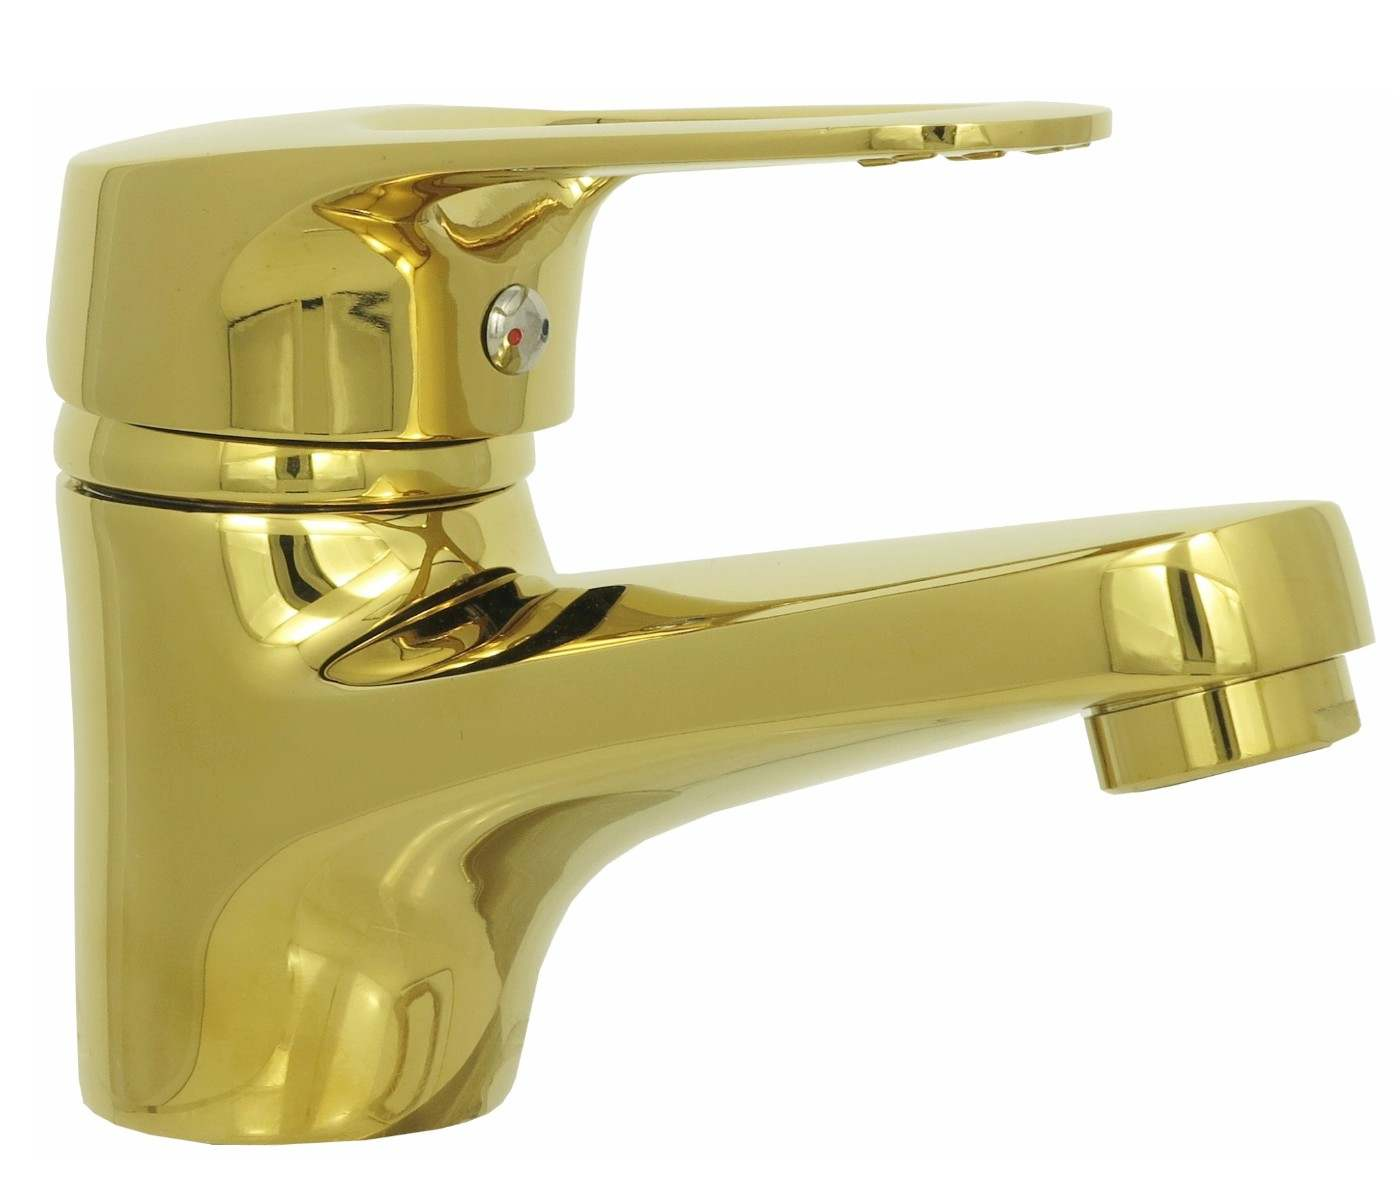 basin water tap mixer tap bathroom kitchen fitting retro. Black Bedroom Furniture Sets. Home Design Ideas